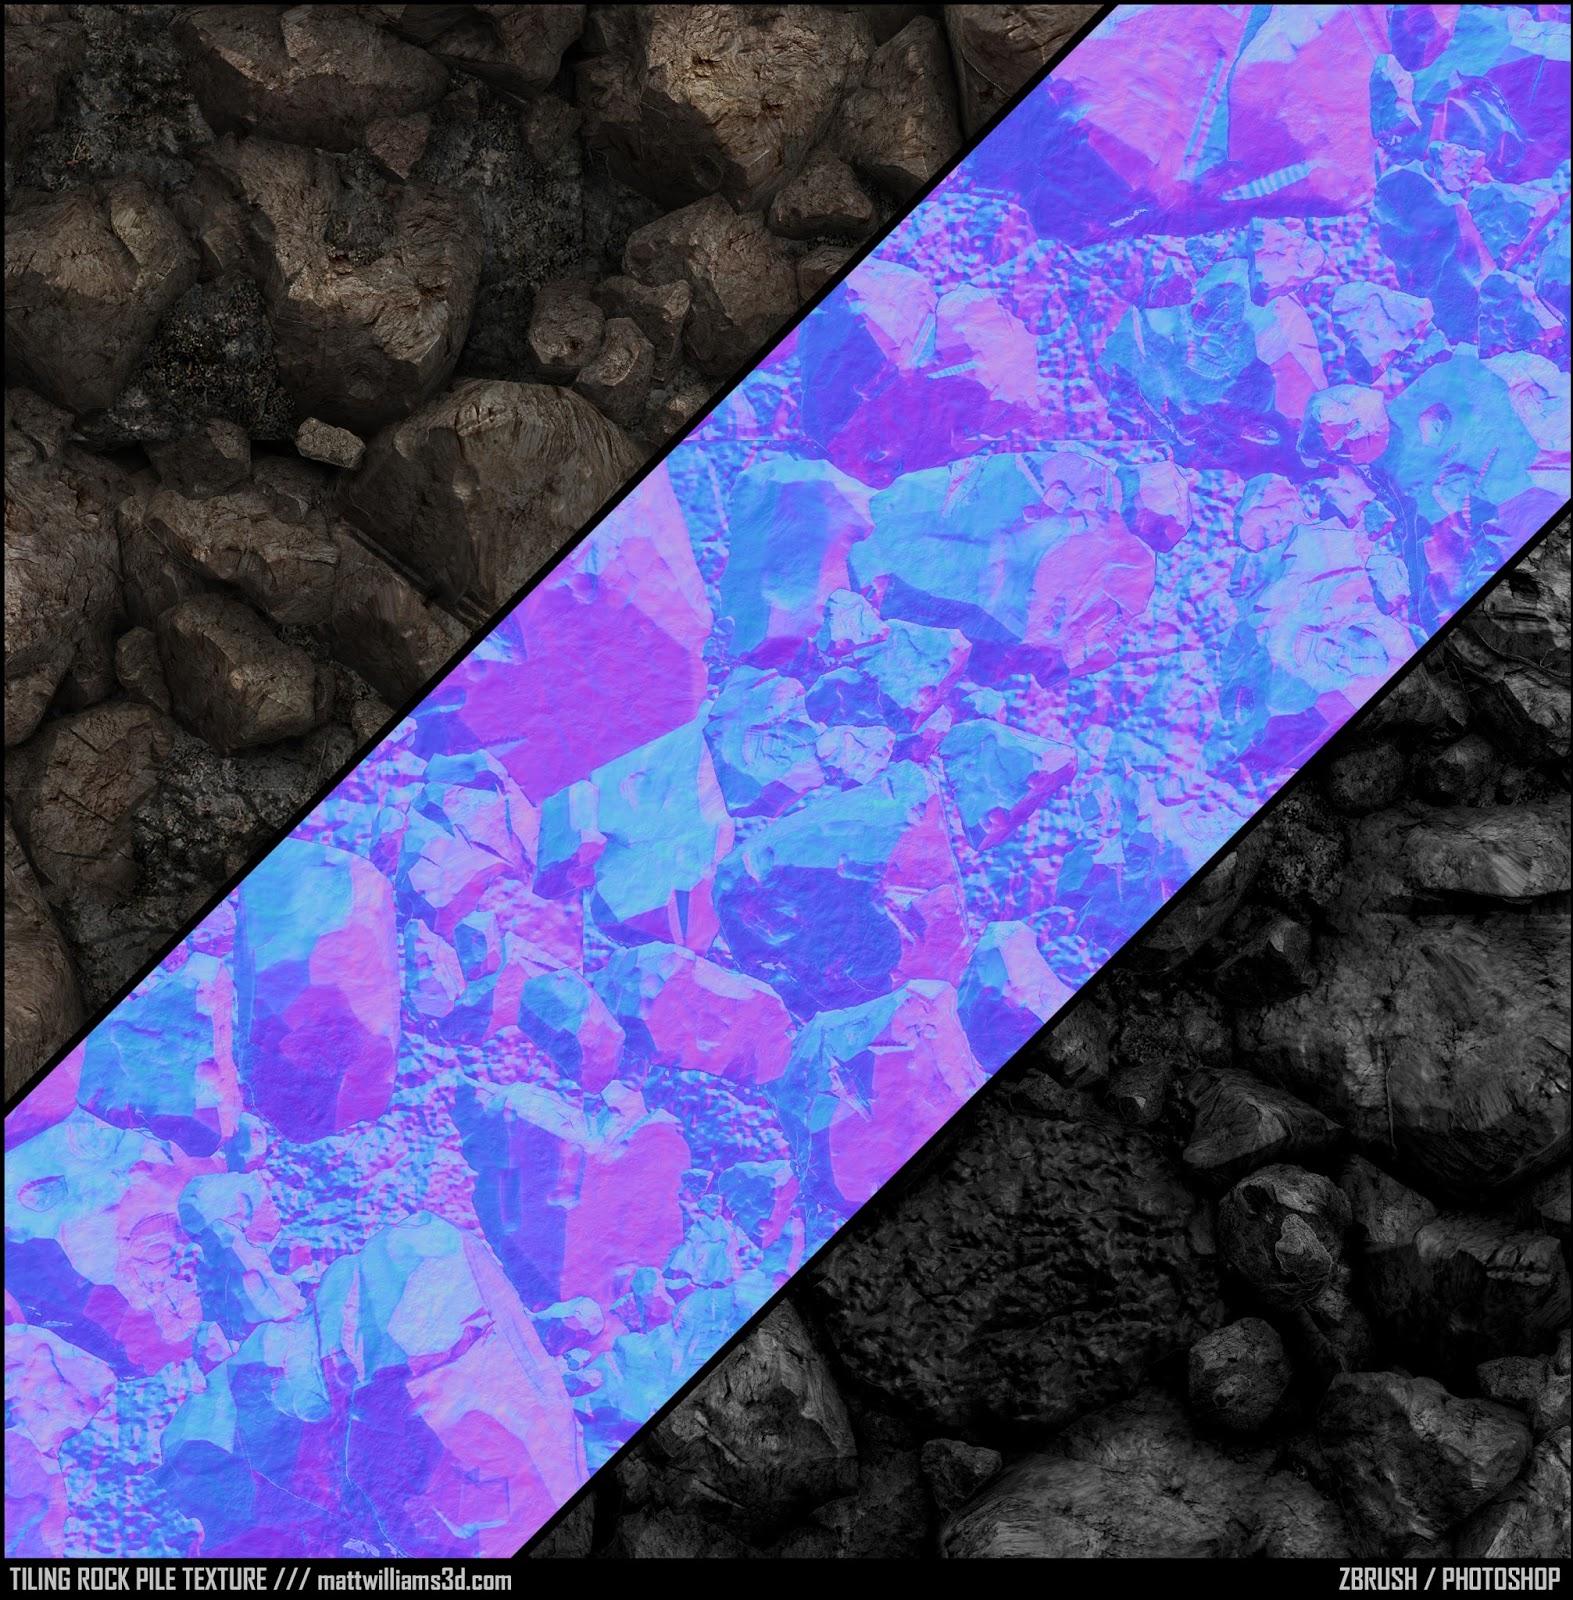 TilingRockPile_Flats.jpg